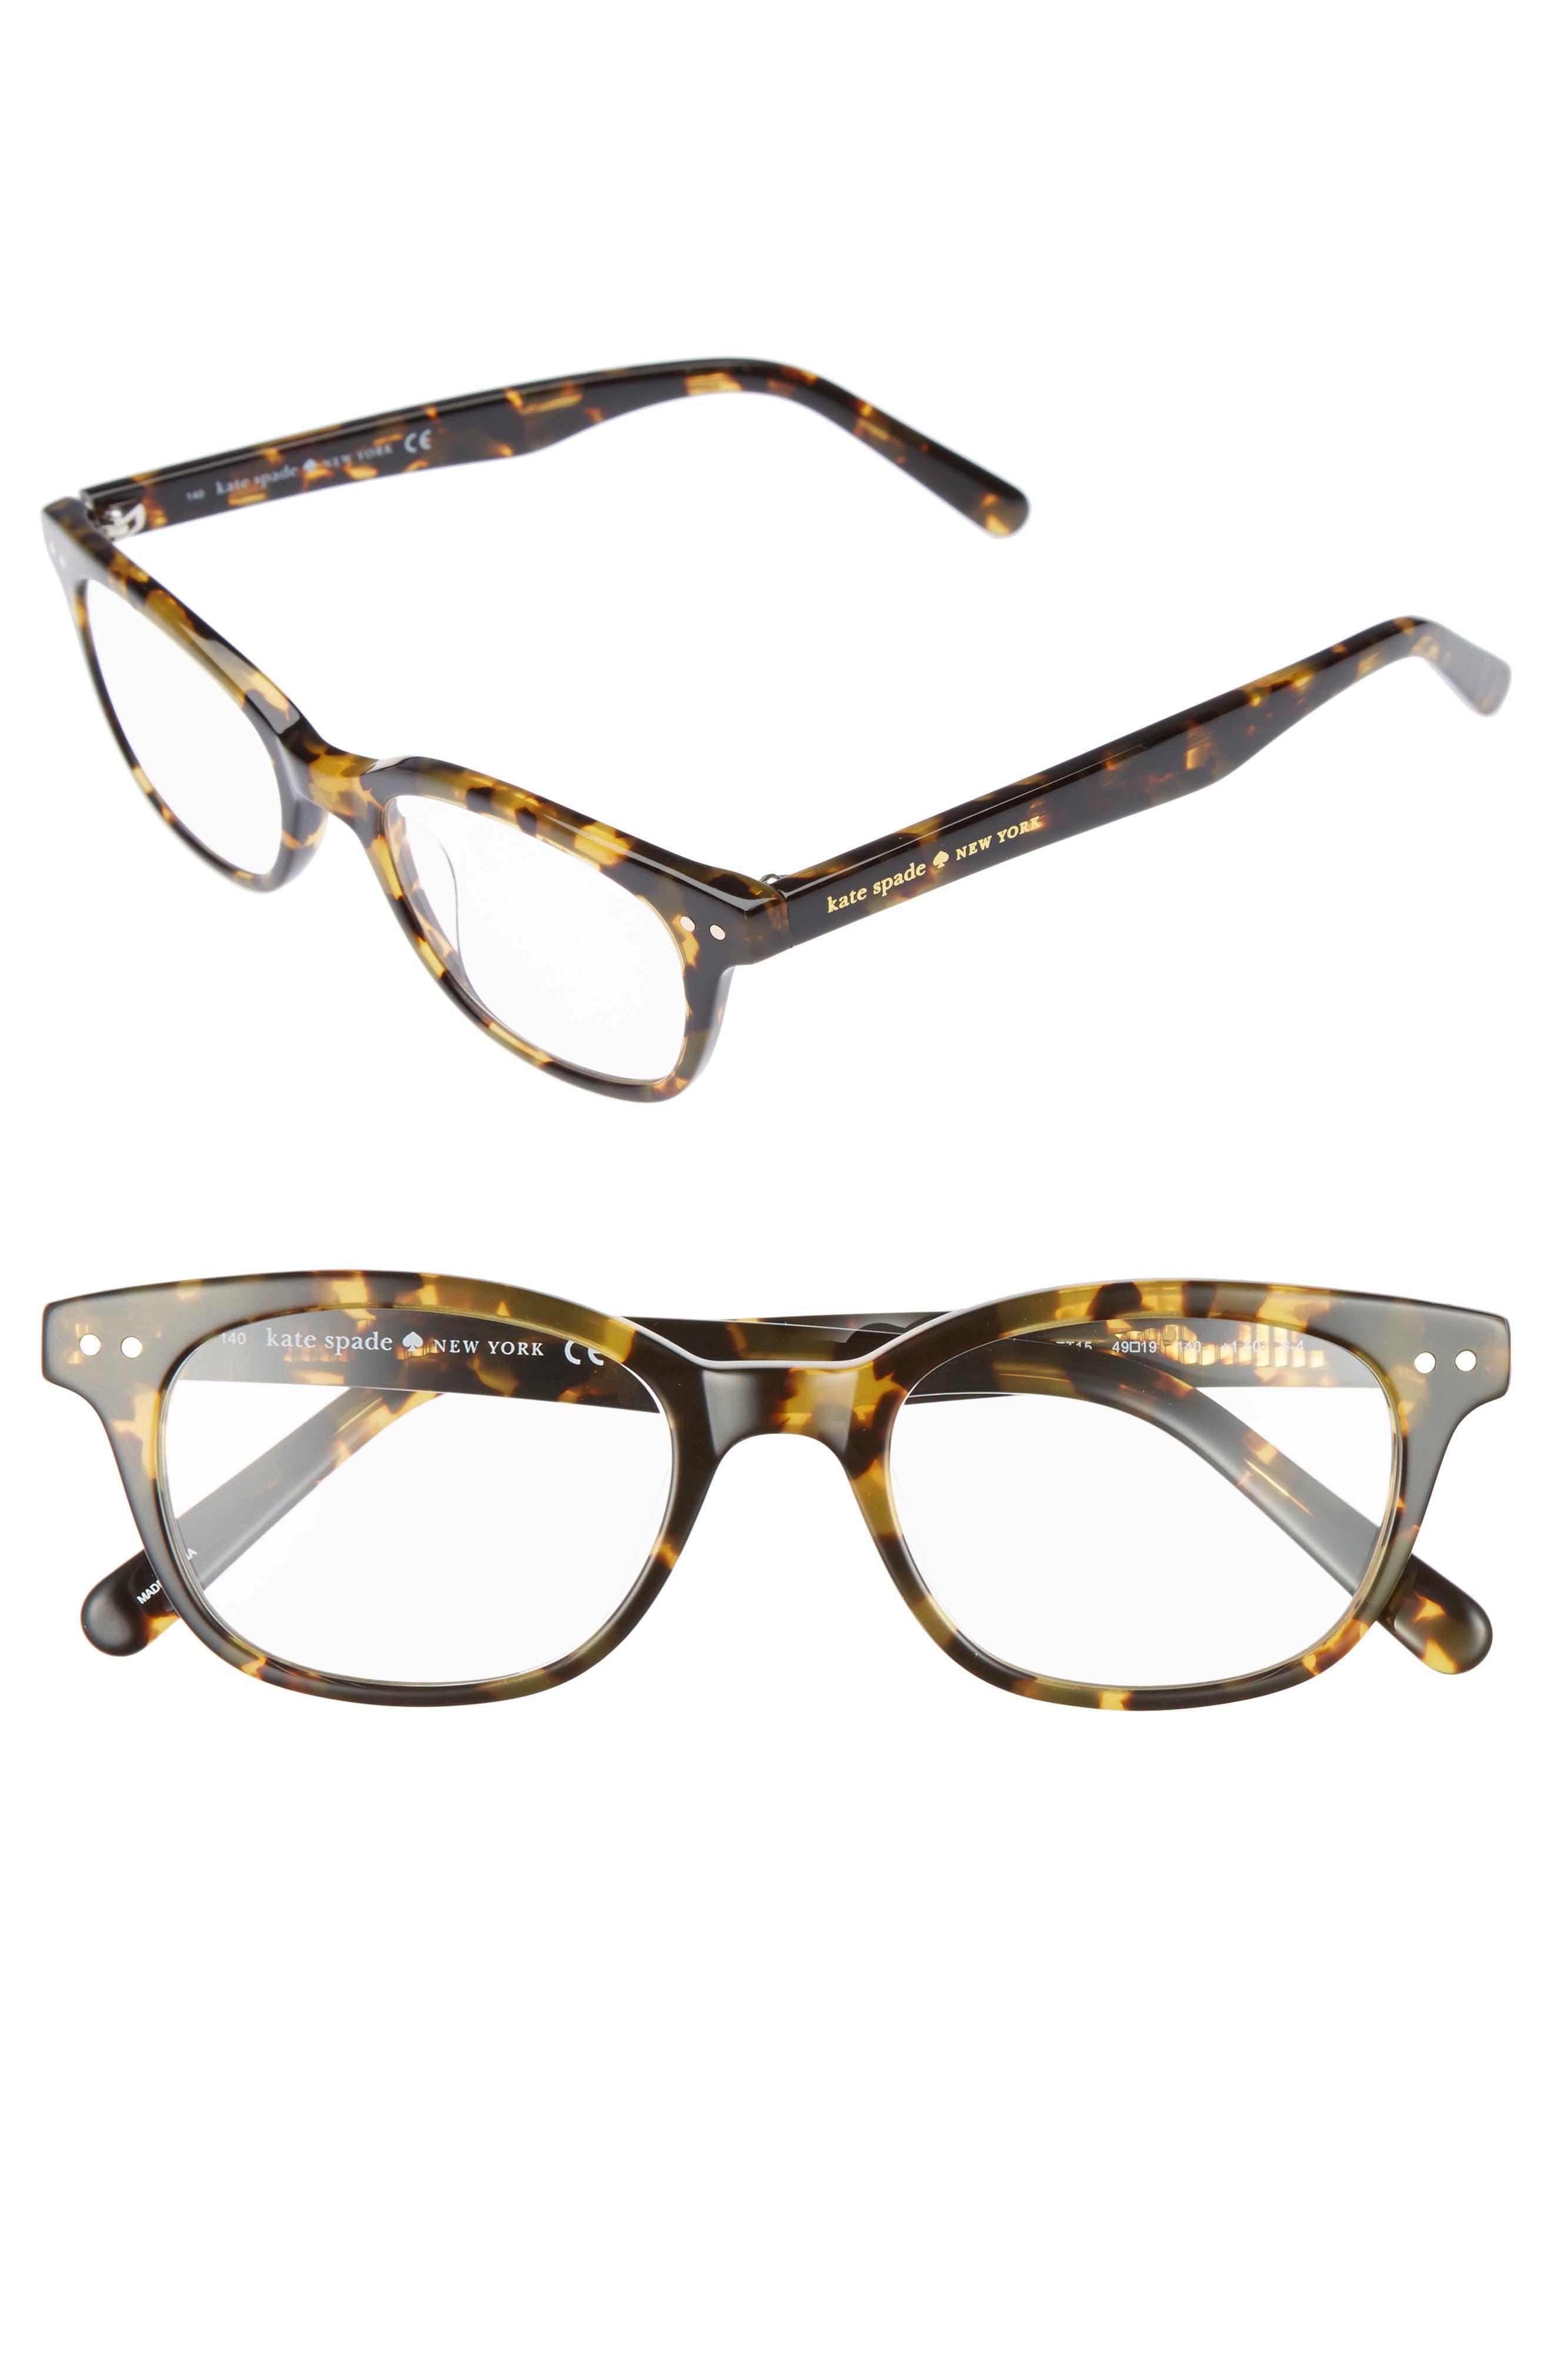 KATE SPADE NEW YORK,                             rebecca 49mm reading glasses,                             Main thumbnail 1, color,                             TOKYO TORTOISE